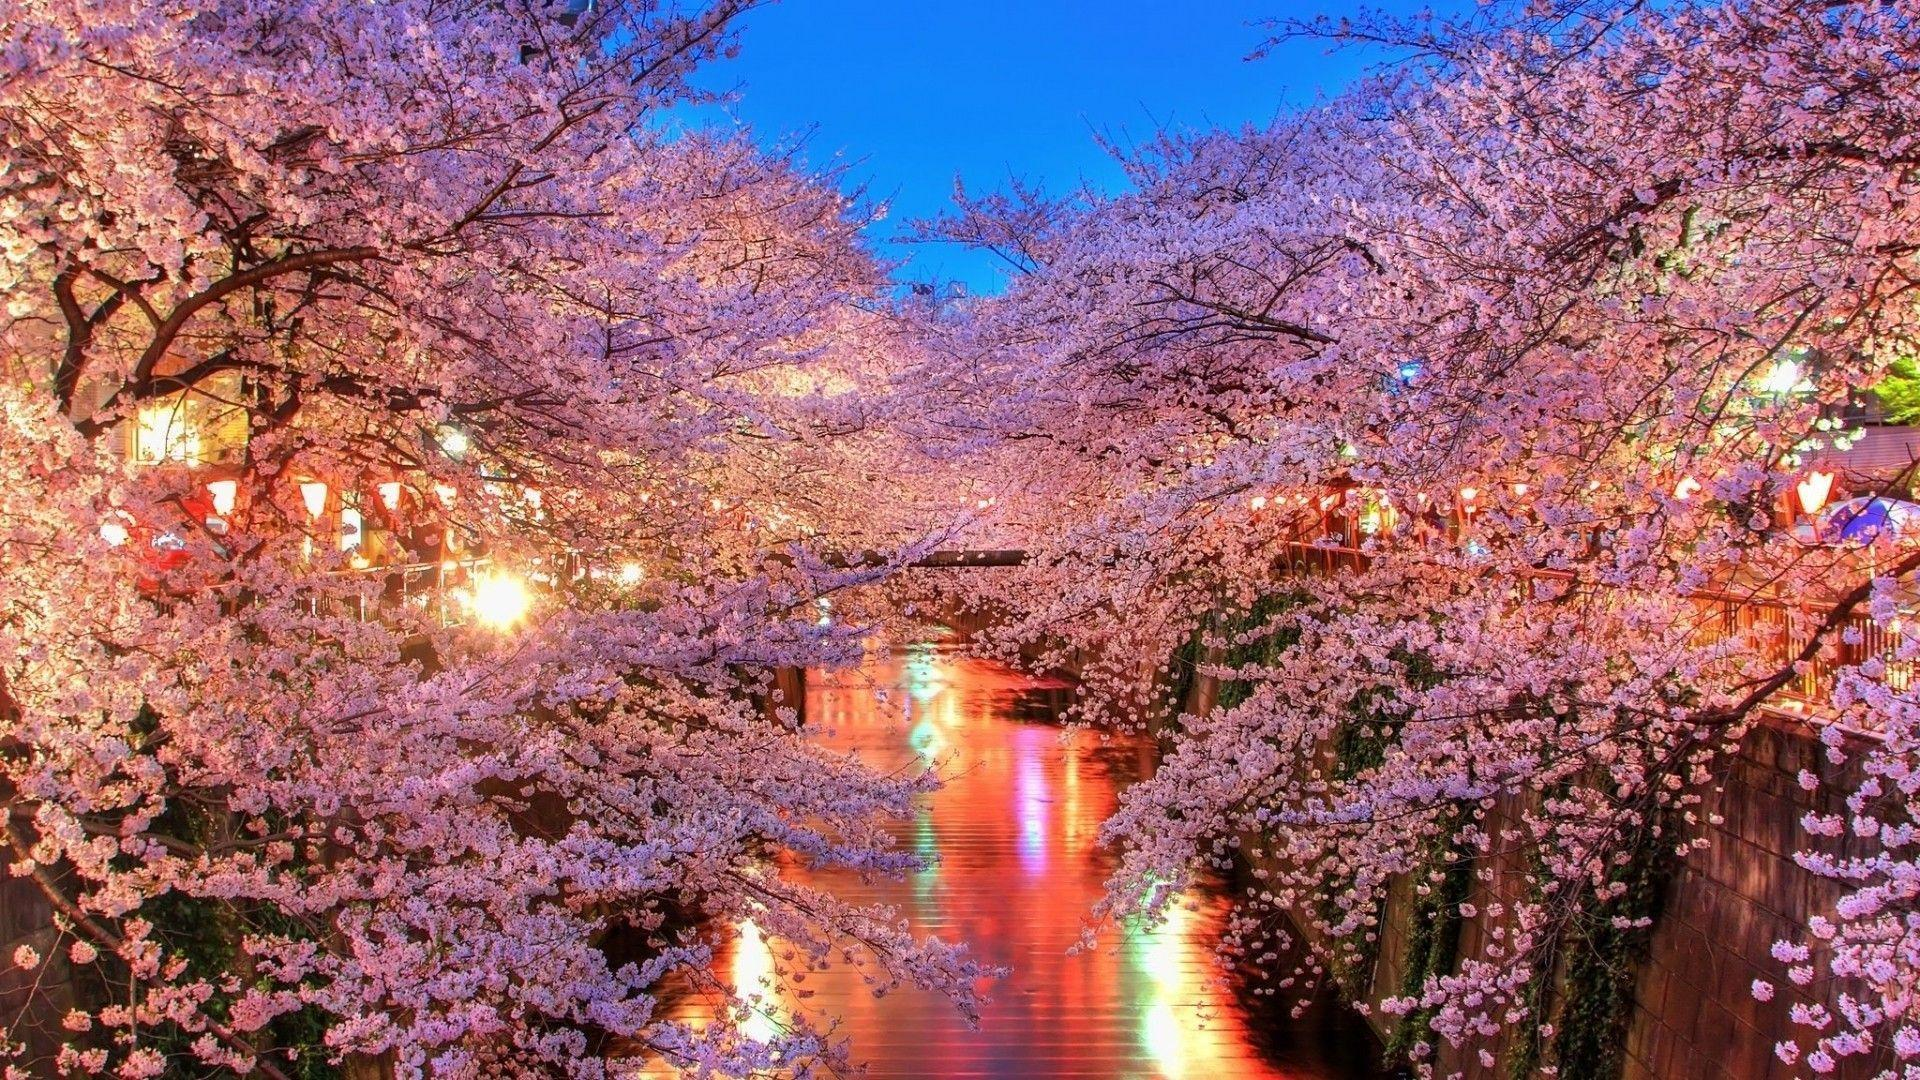 Cherry Blossom Desktop Backgrounds 1920x1080